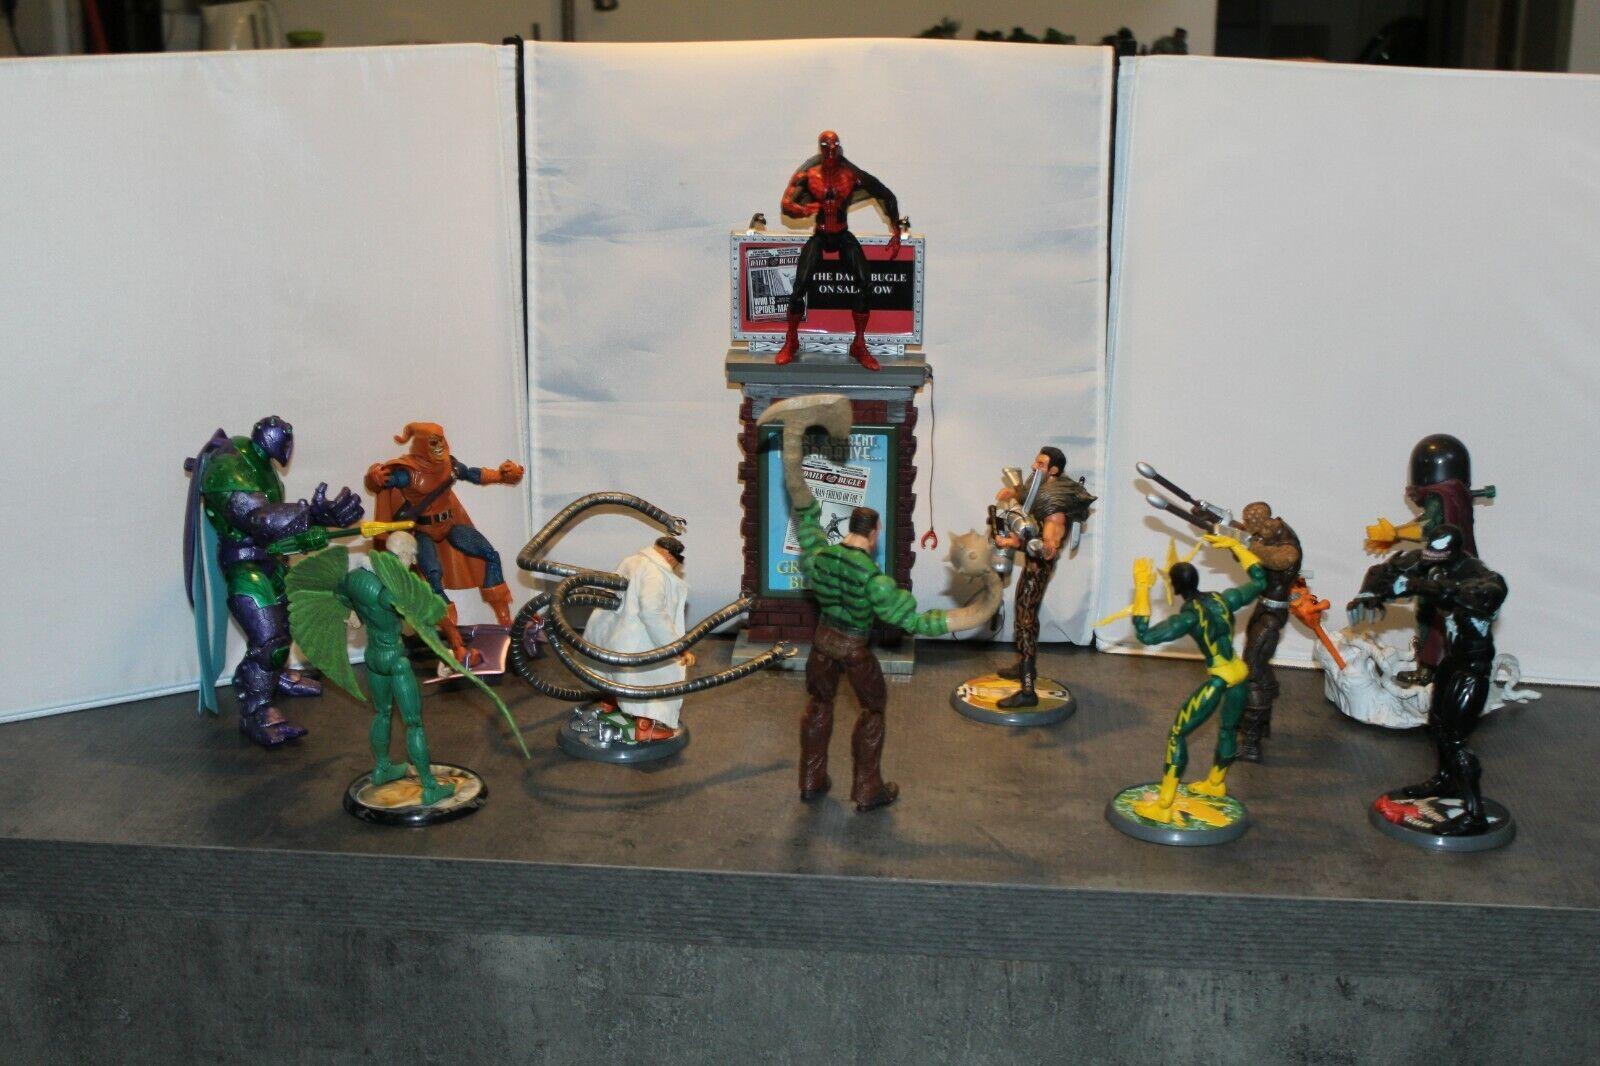 Spideruomo, MYSTERIO, DOC OCCA, avvoltoio, Kraven, electro, Seuomo, Venom, Shocker